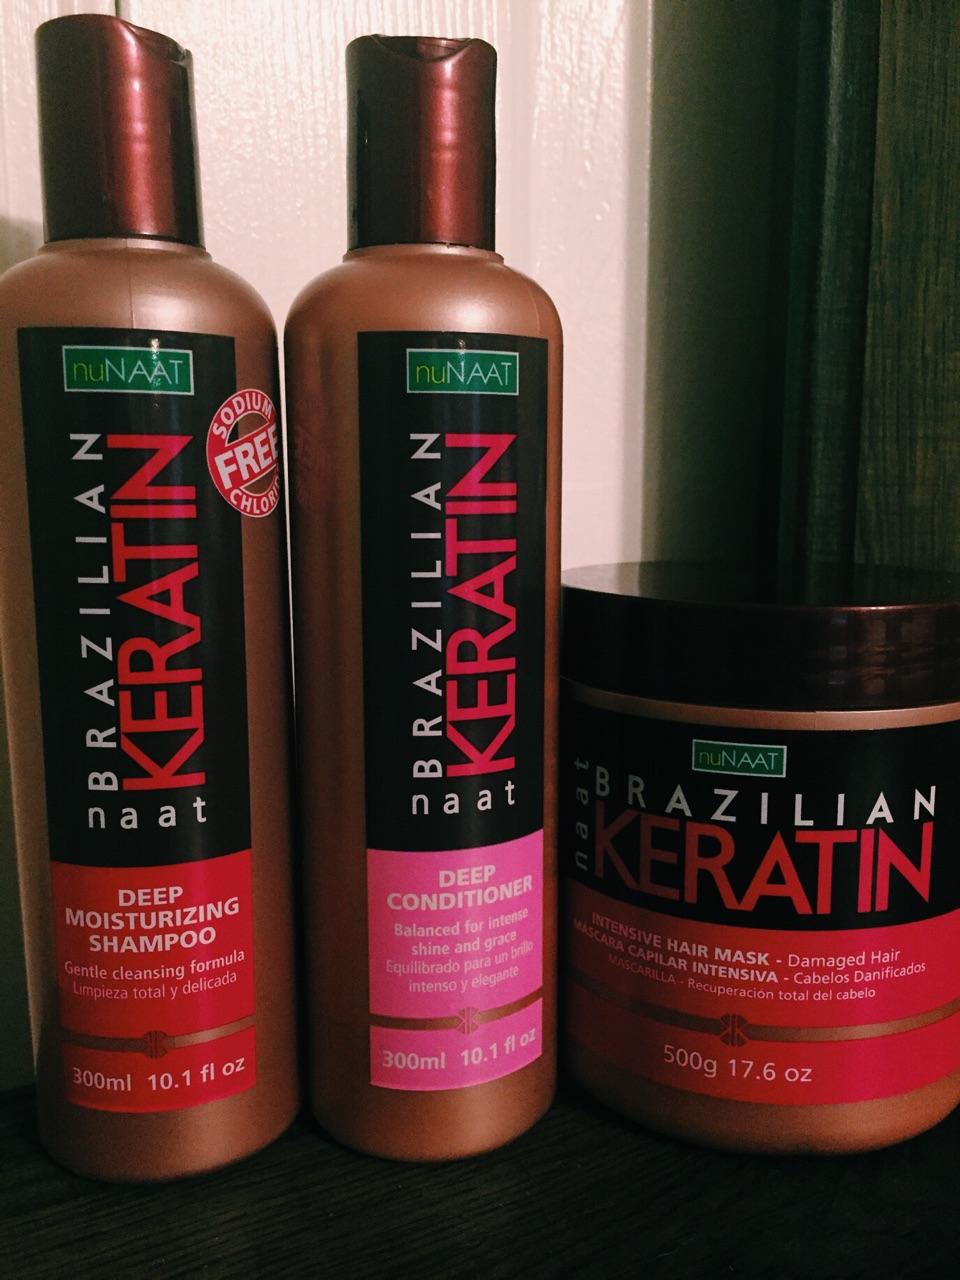 nuNAAT Brazilian Keratin Hair Mask